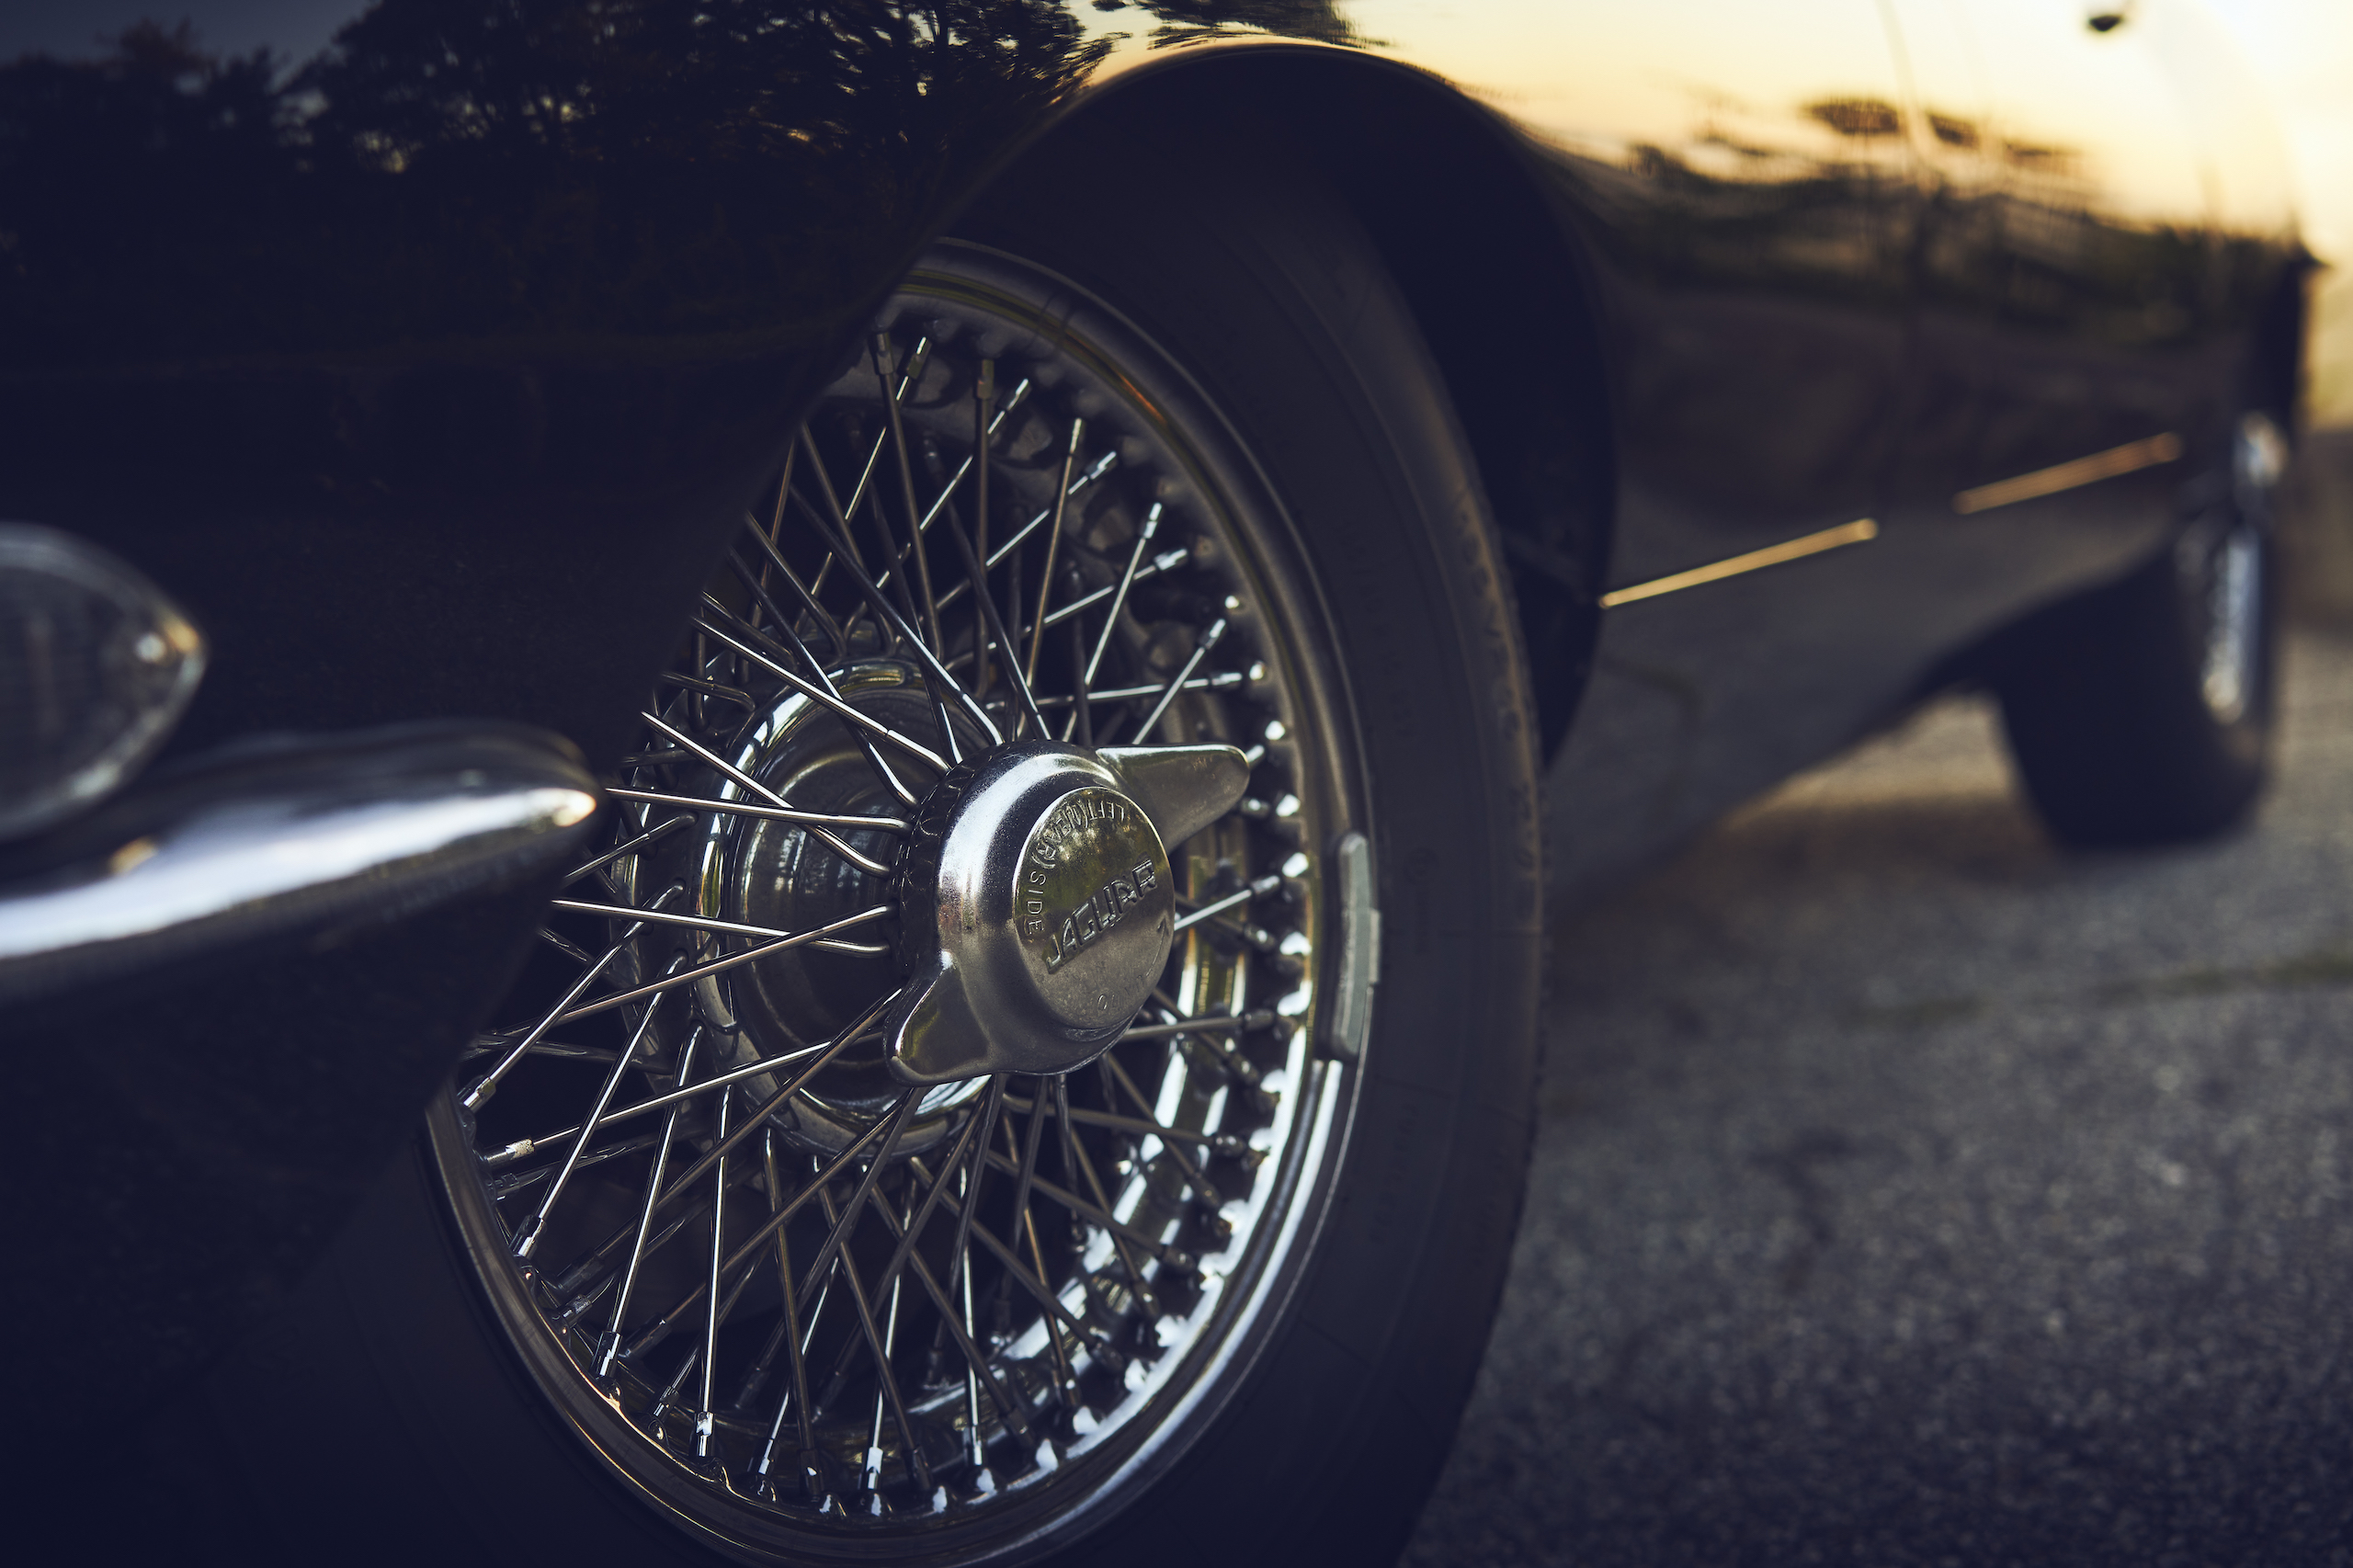 Jaguar E-Type wheel hub spoke detail